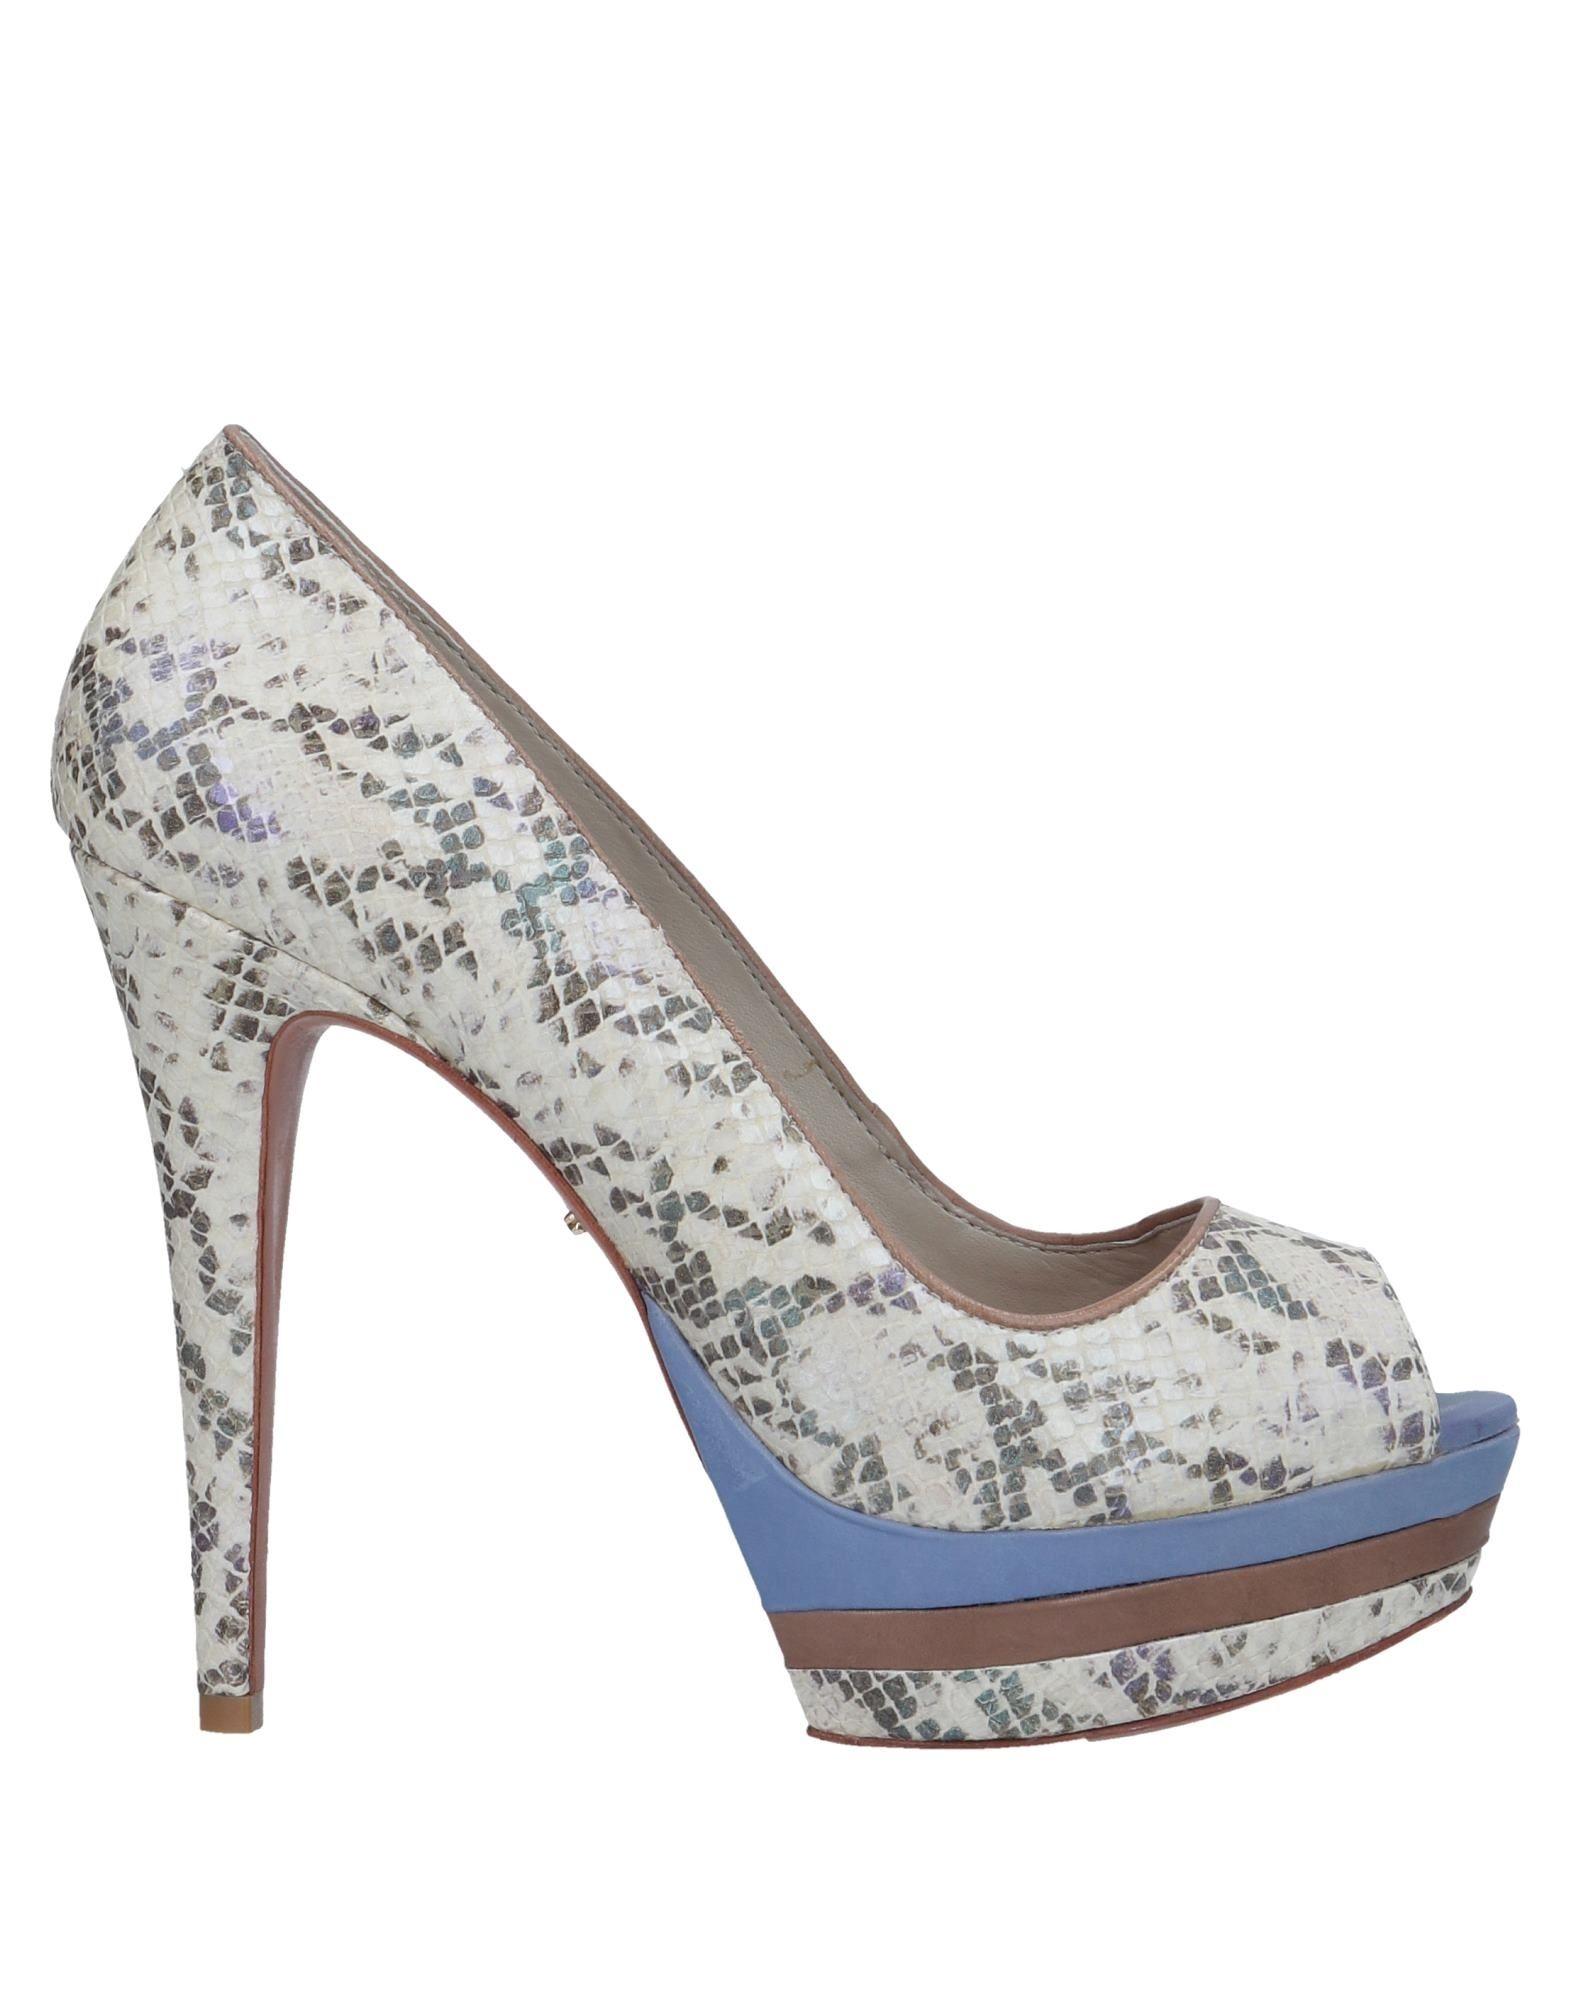 Sandali Sara Donna e - 11499772GK Nuove offerte e Donna scarpe comode 407d5d